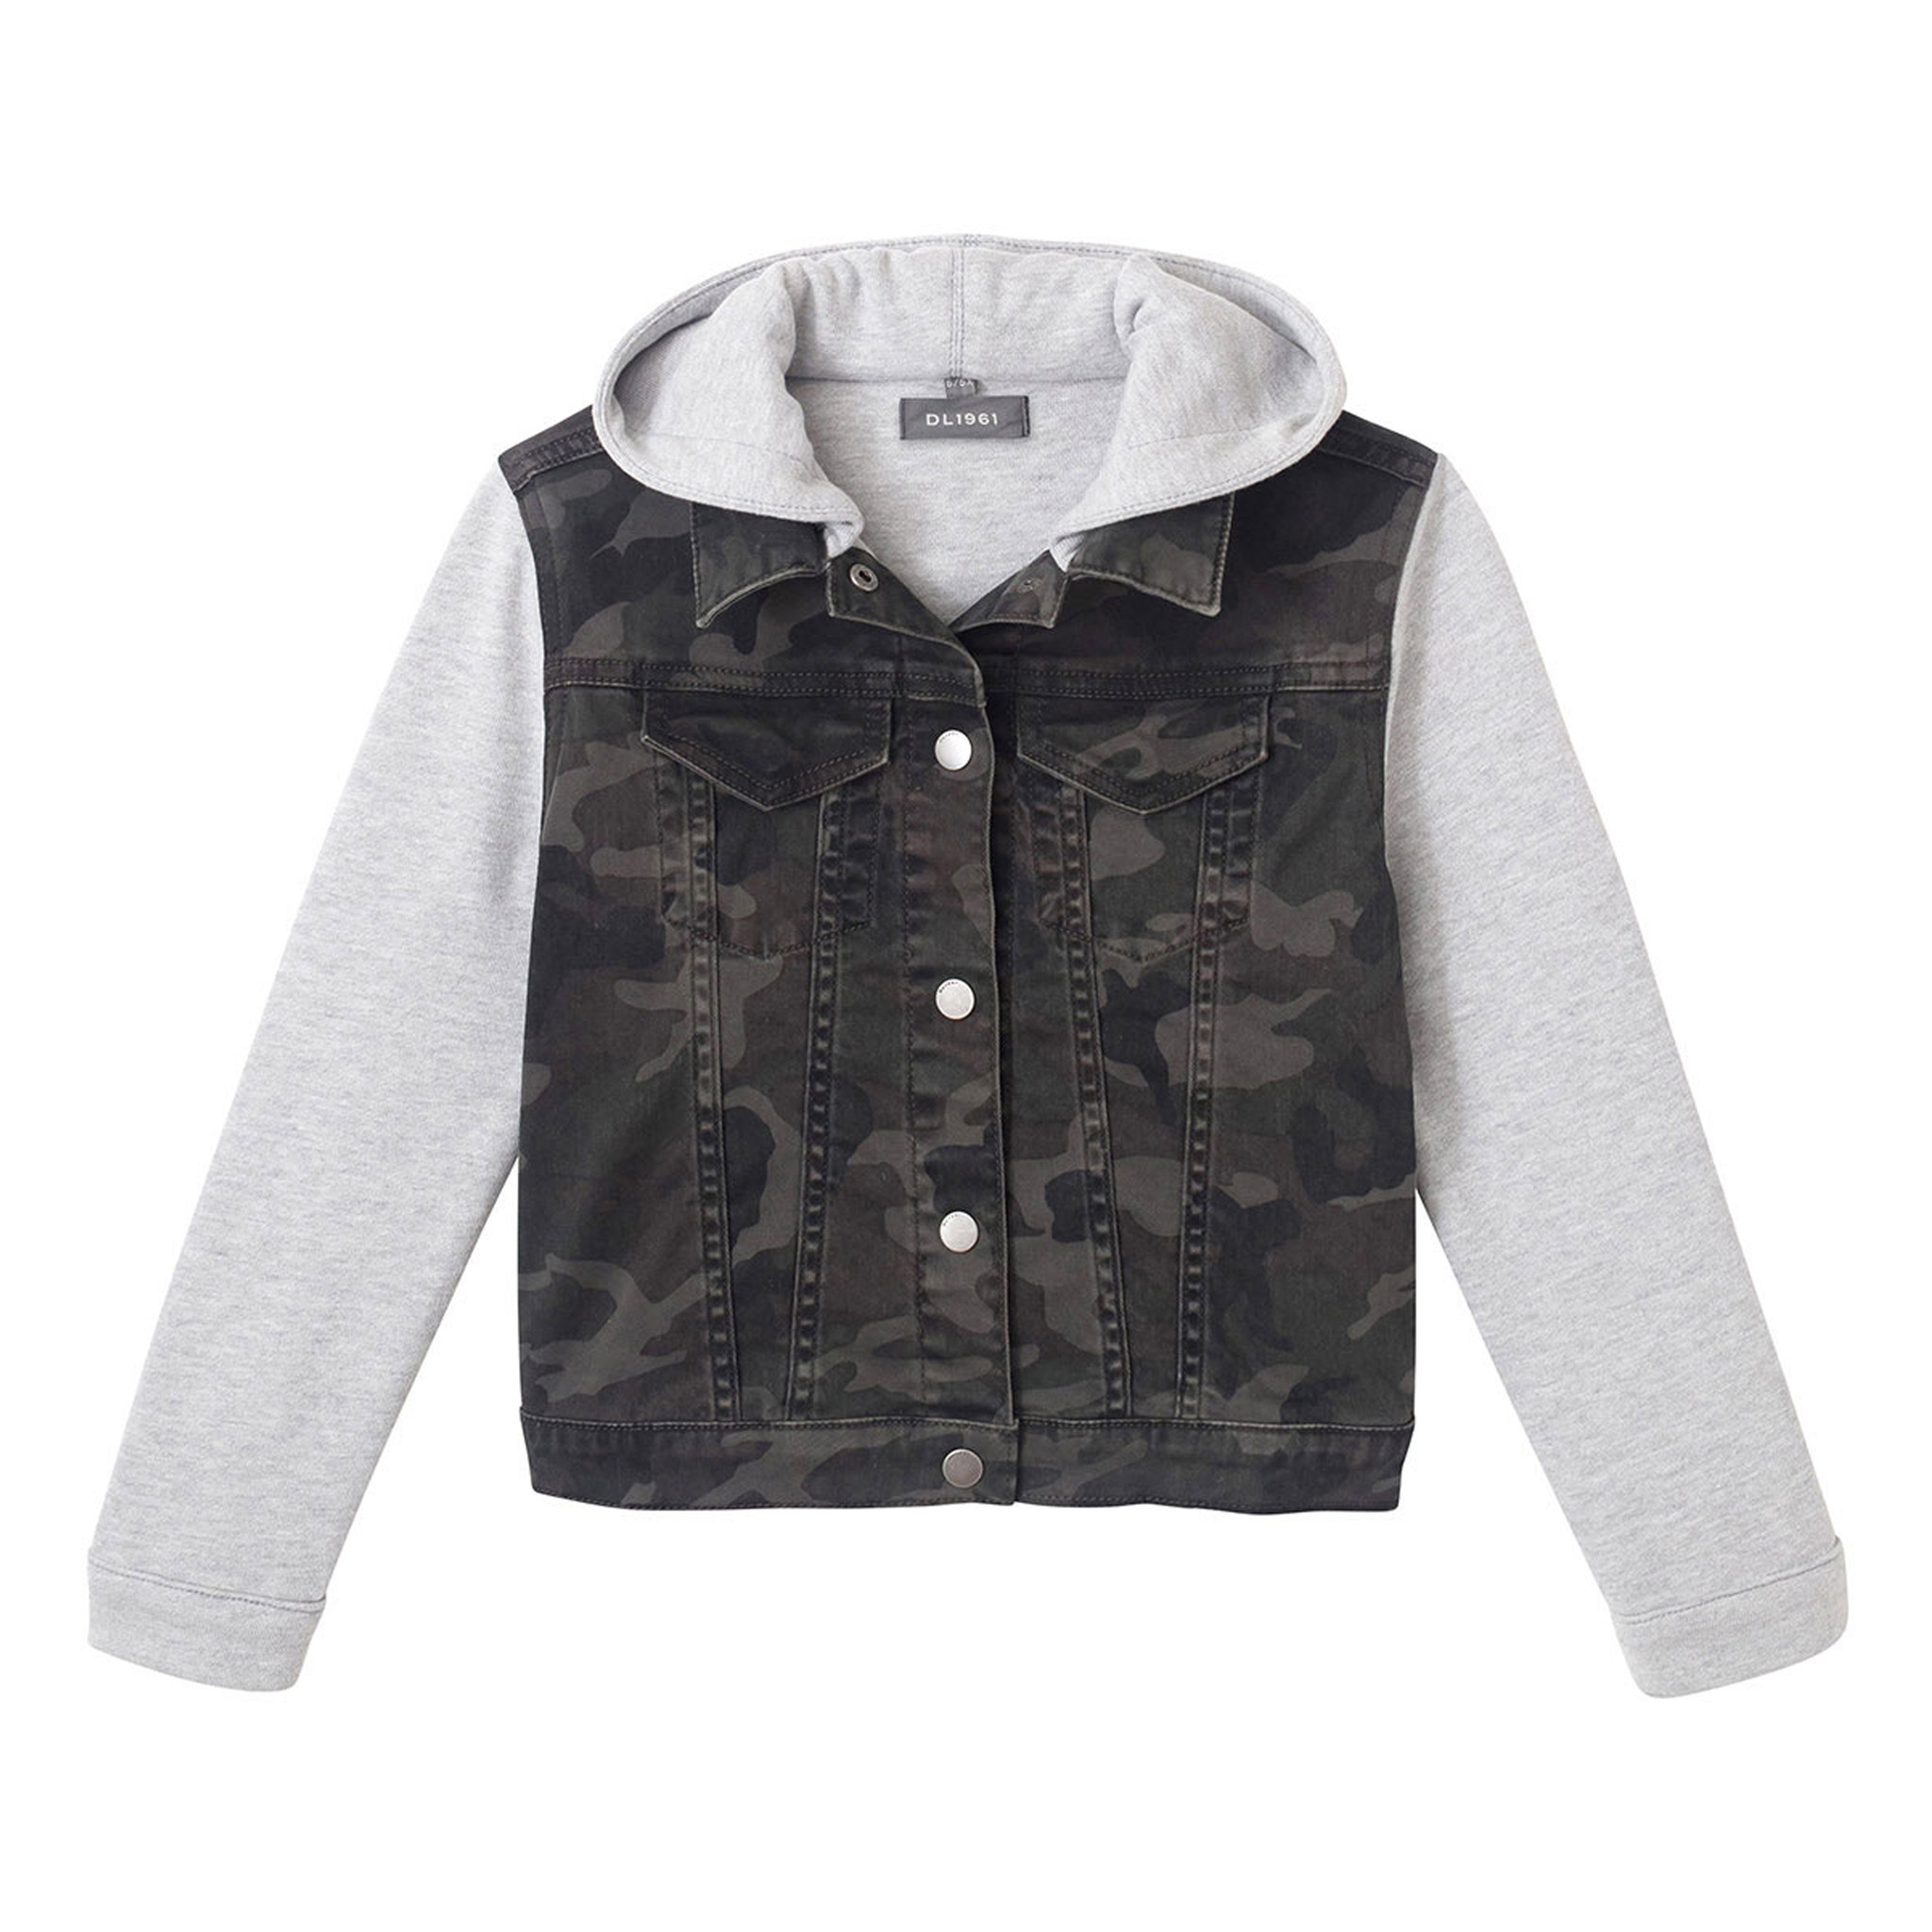 DL1961 Camo Print Jacket